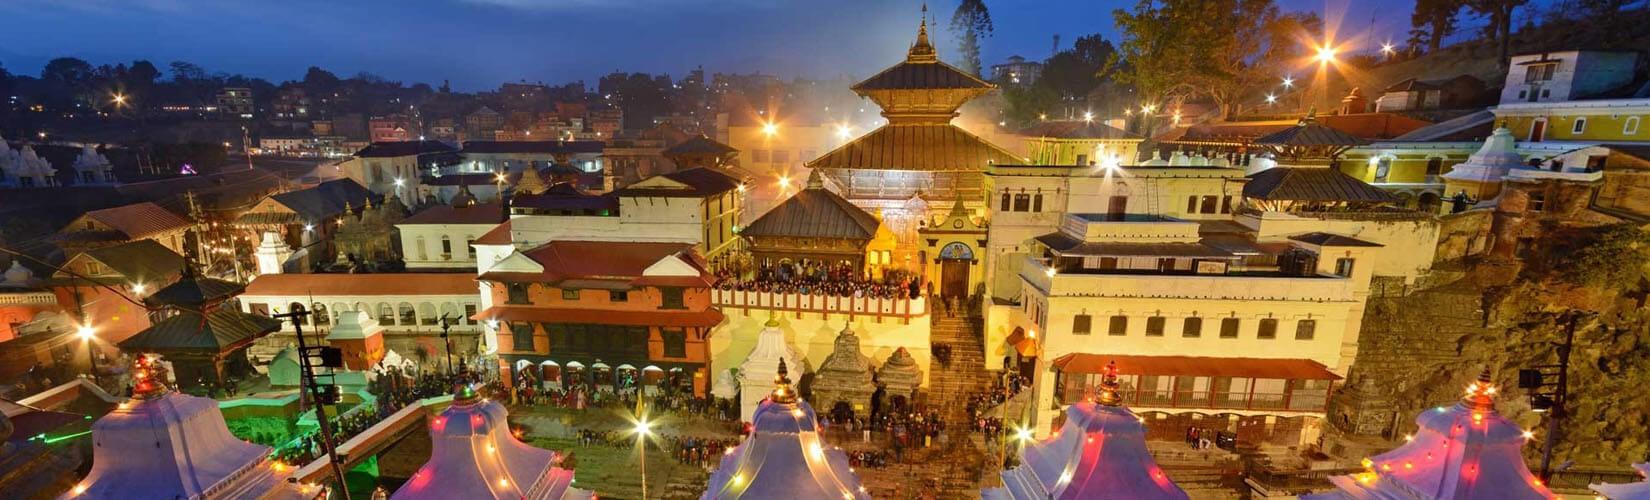 Tour in Nepal | Tour Package in Nepal | Reasonable Treks